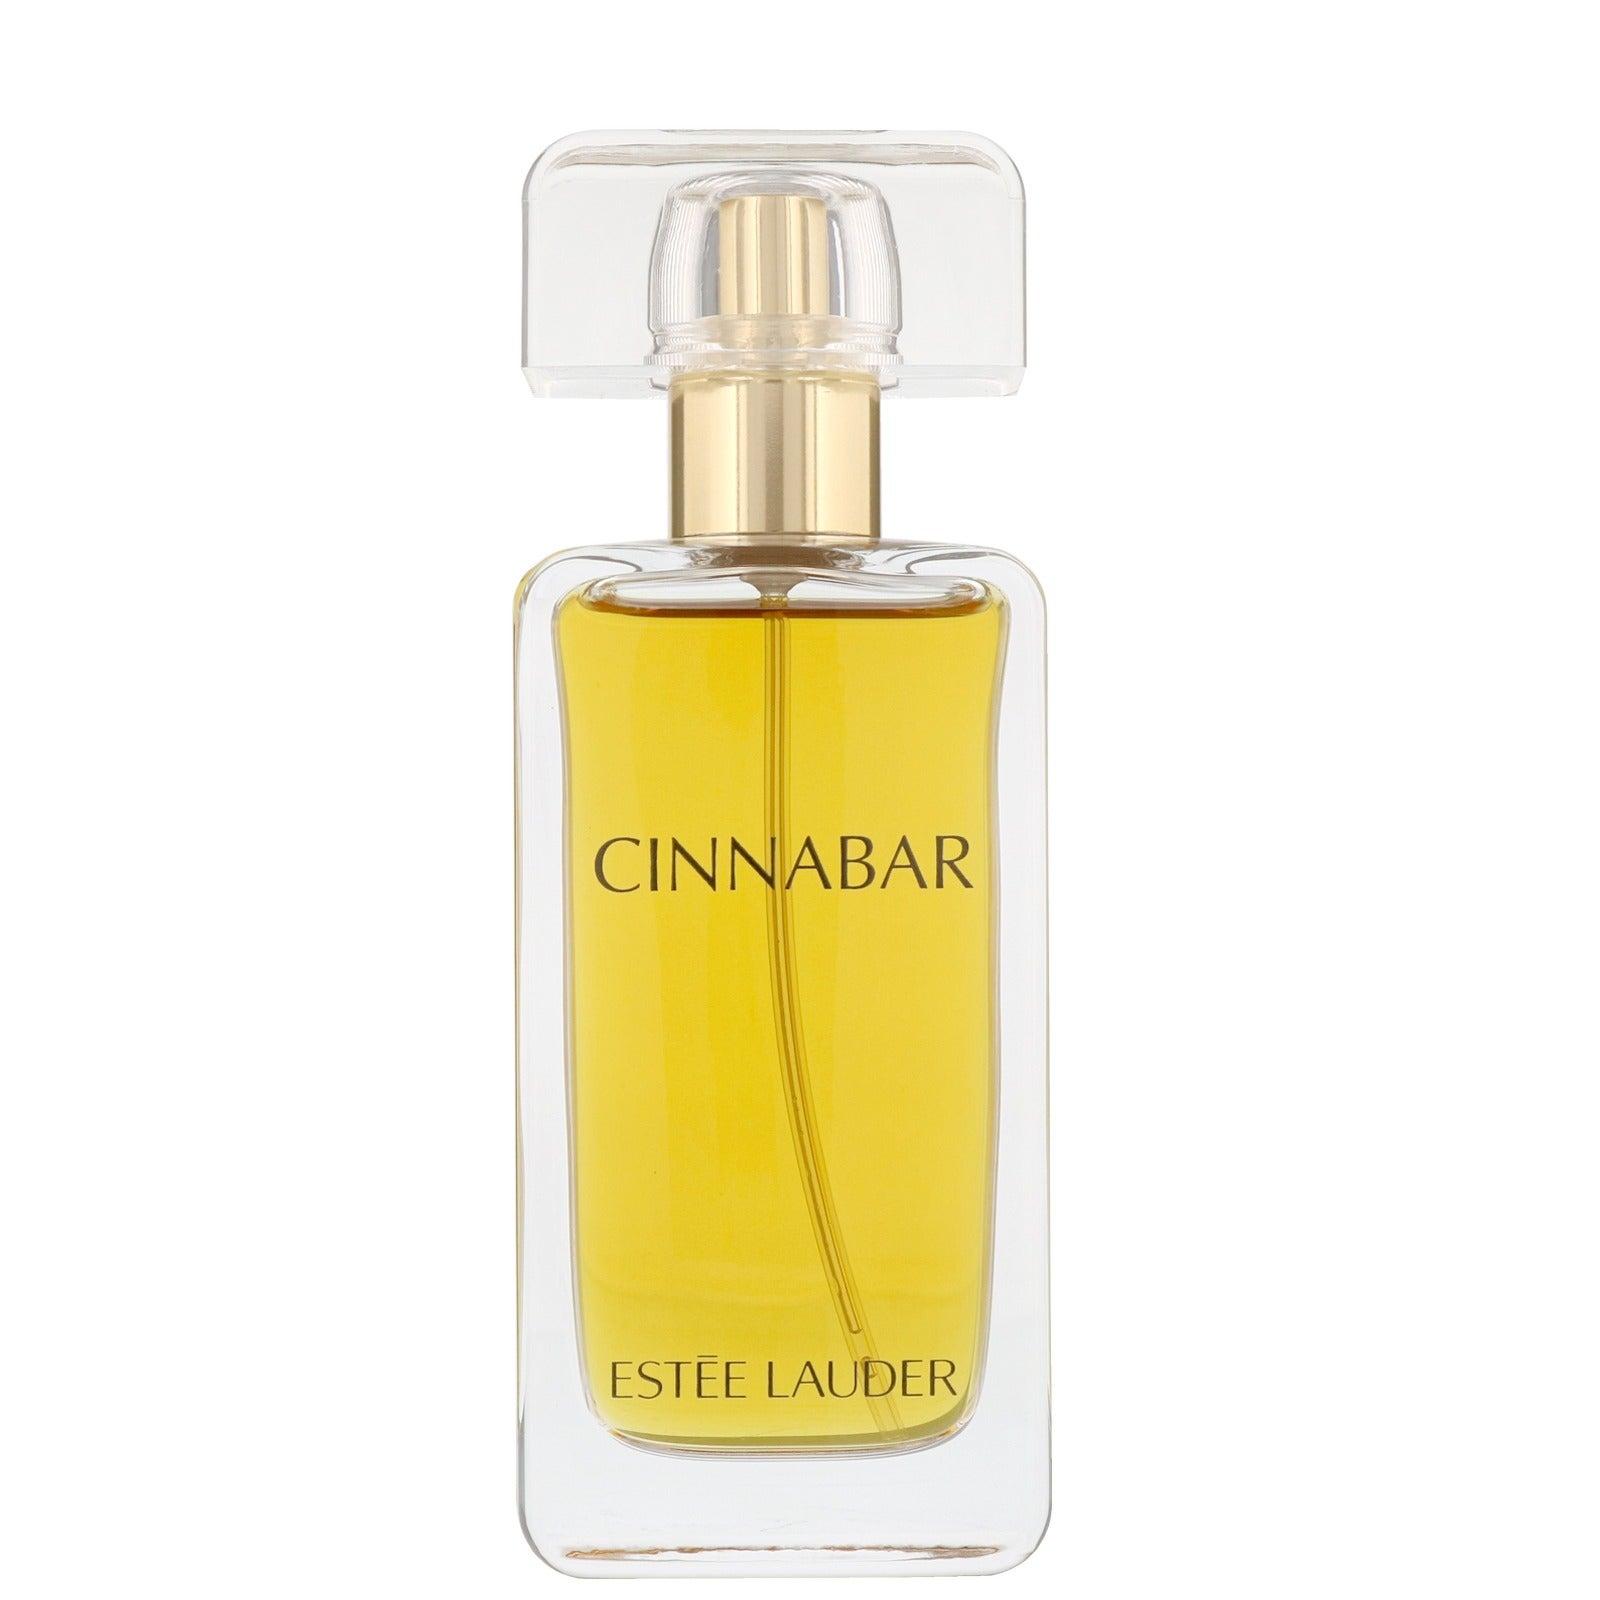 Estee Lauder Cinnabar Women's Perfume